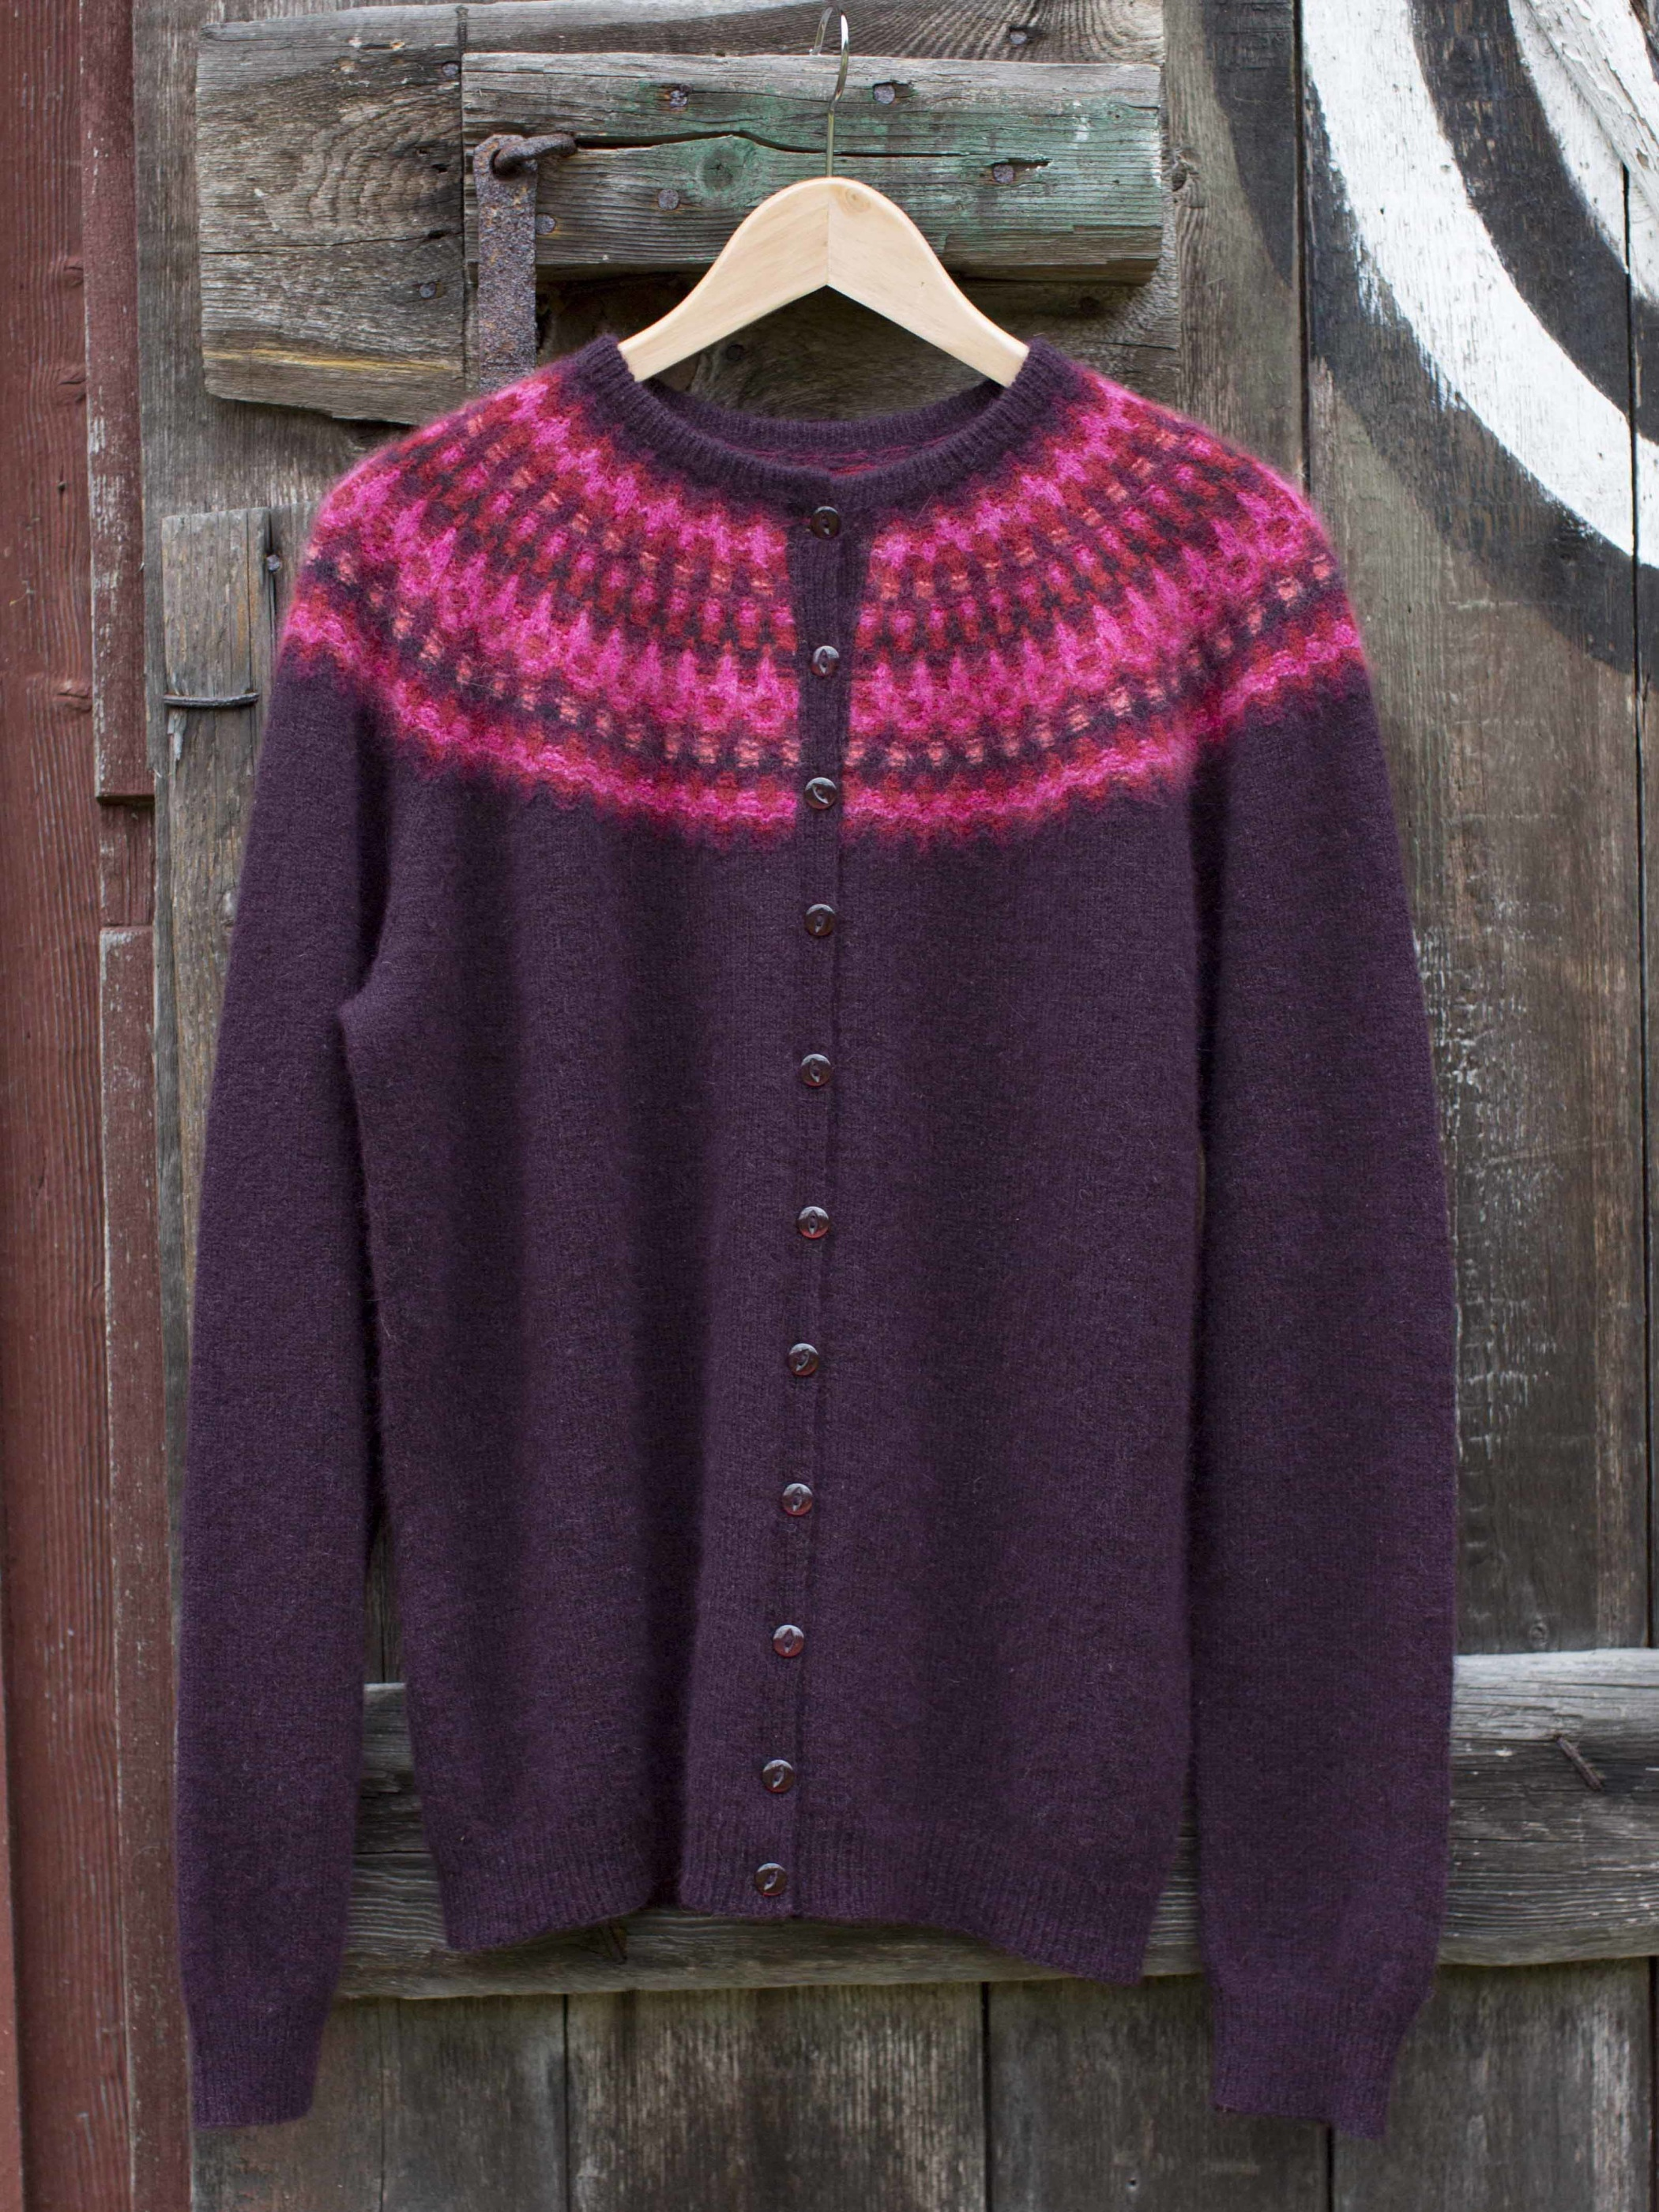 Bohus Stickning Nya Azalean pullover/cardigan aubergine mc